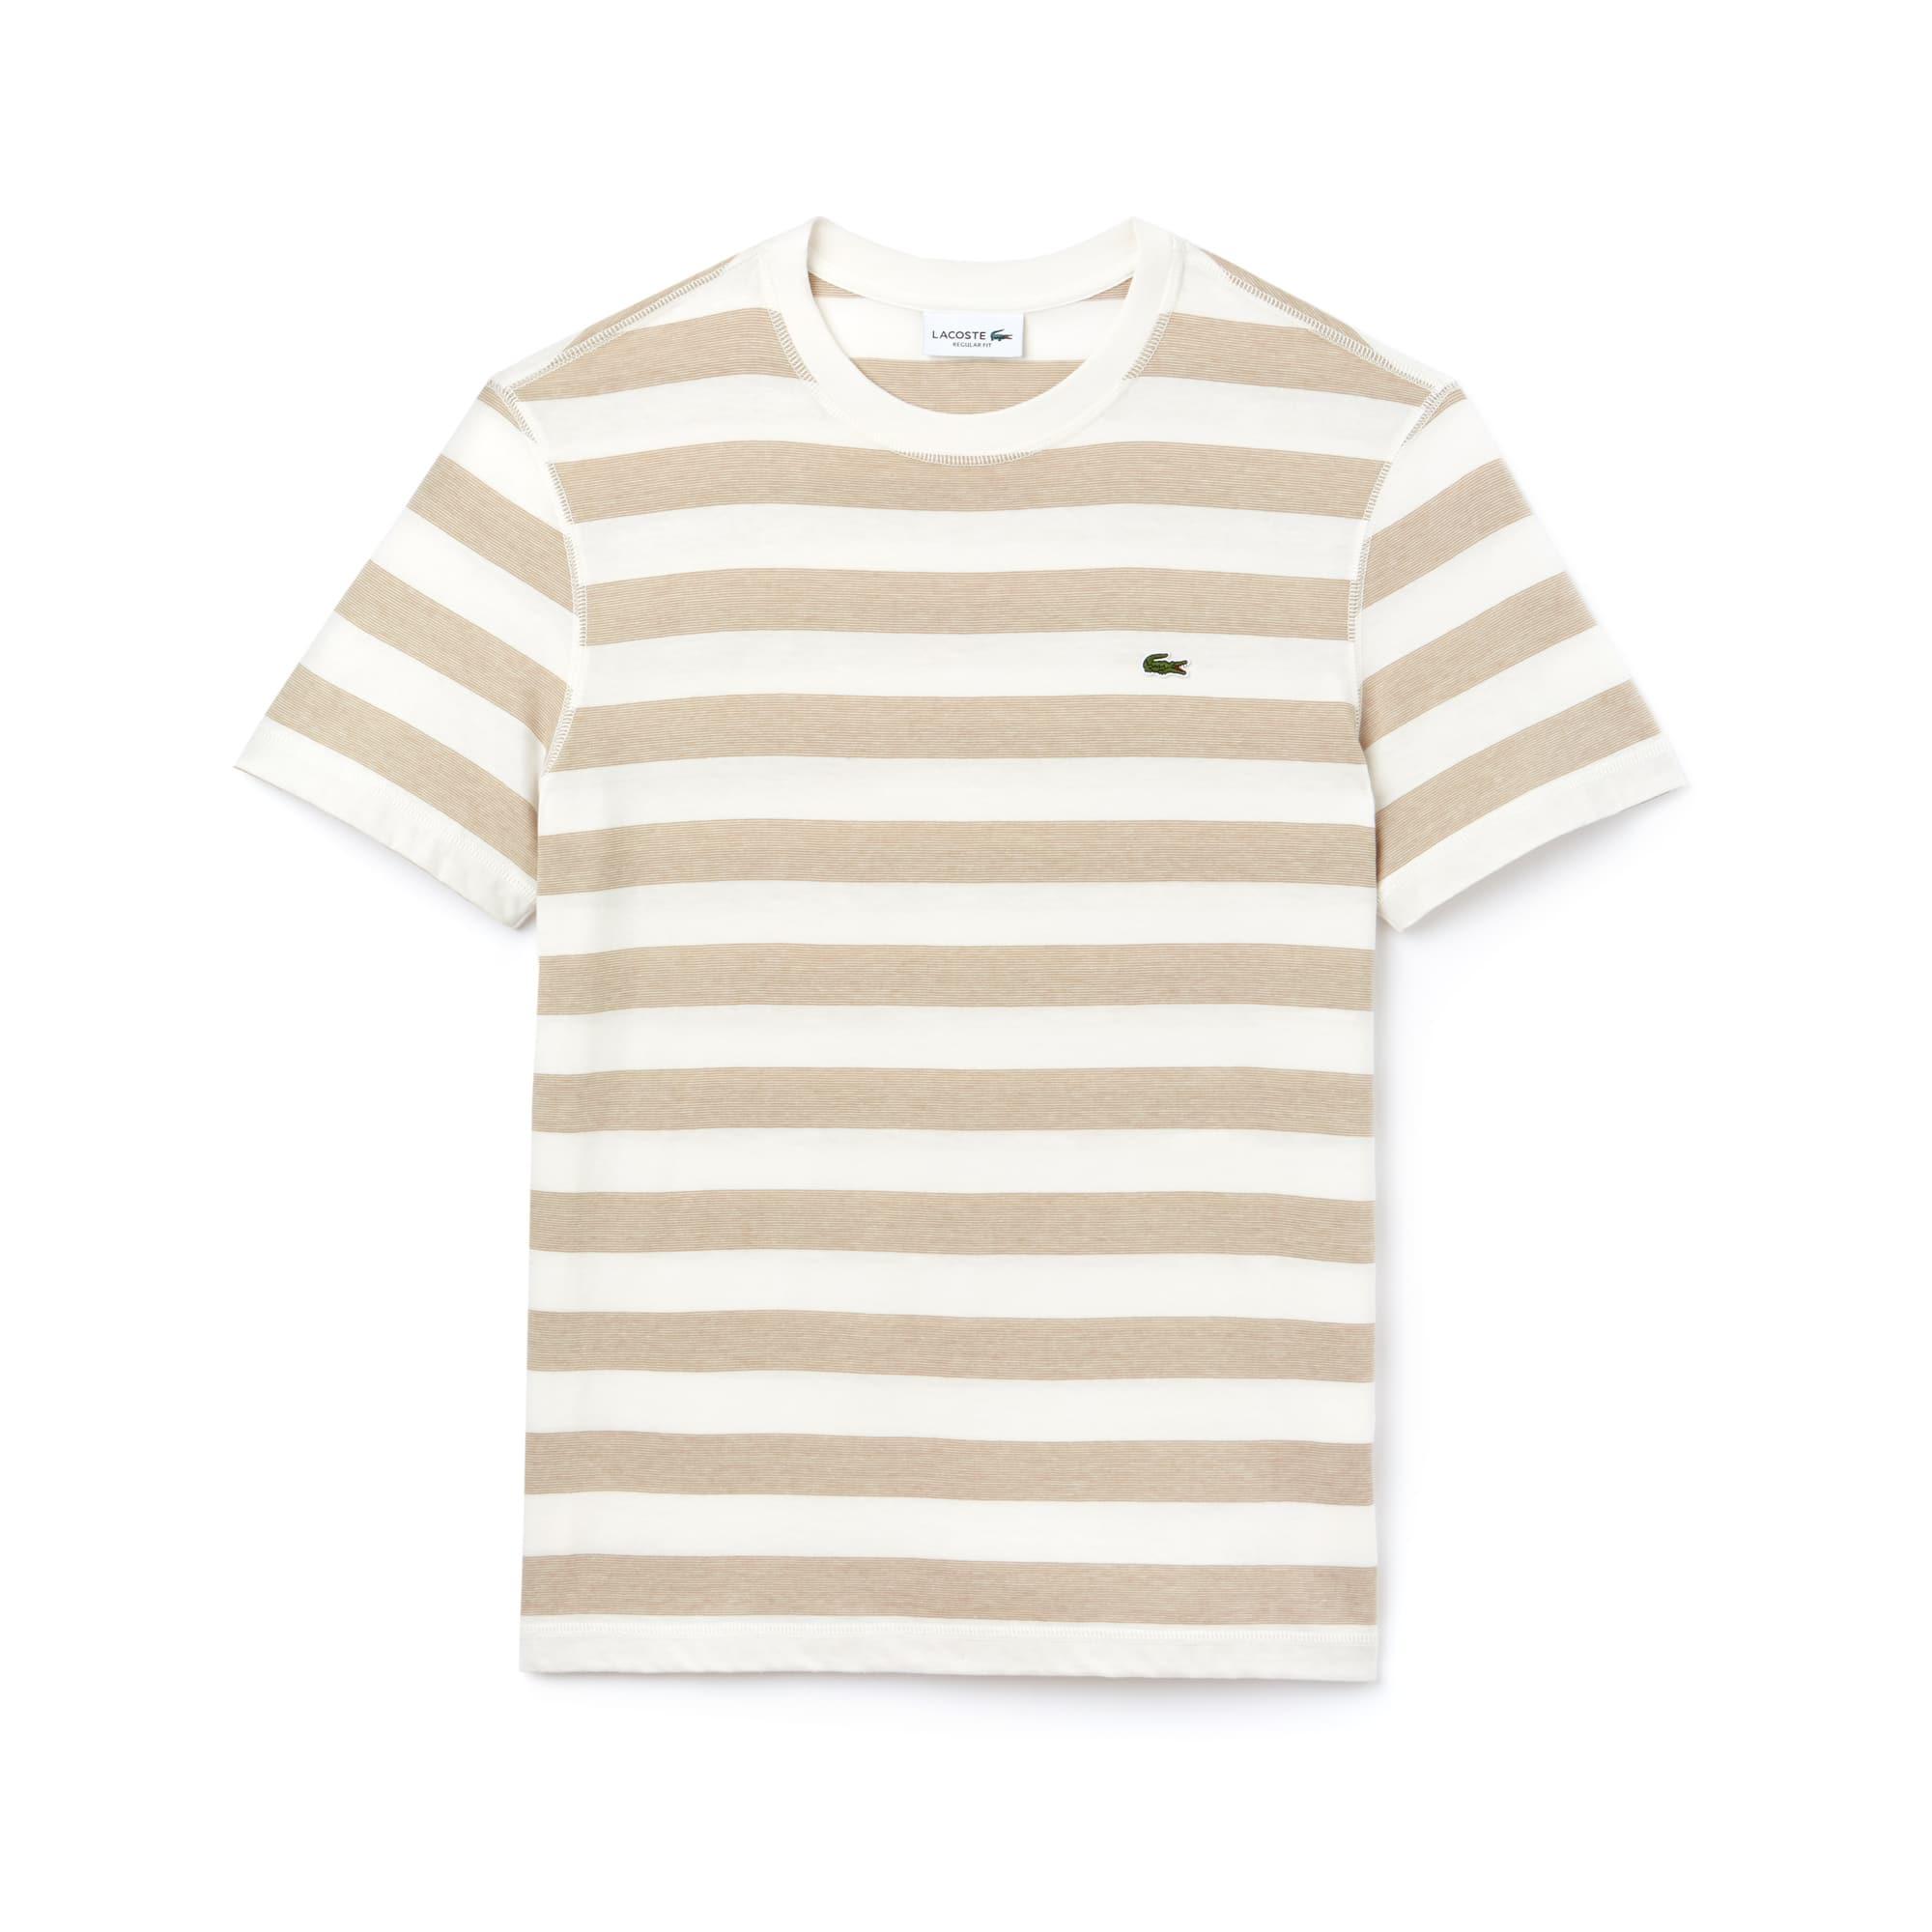 Men's Crew Neck Striped Cotton Jersey T-shirt